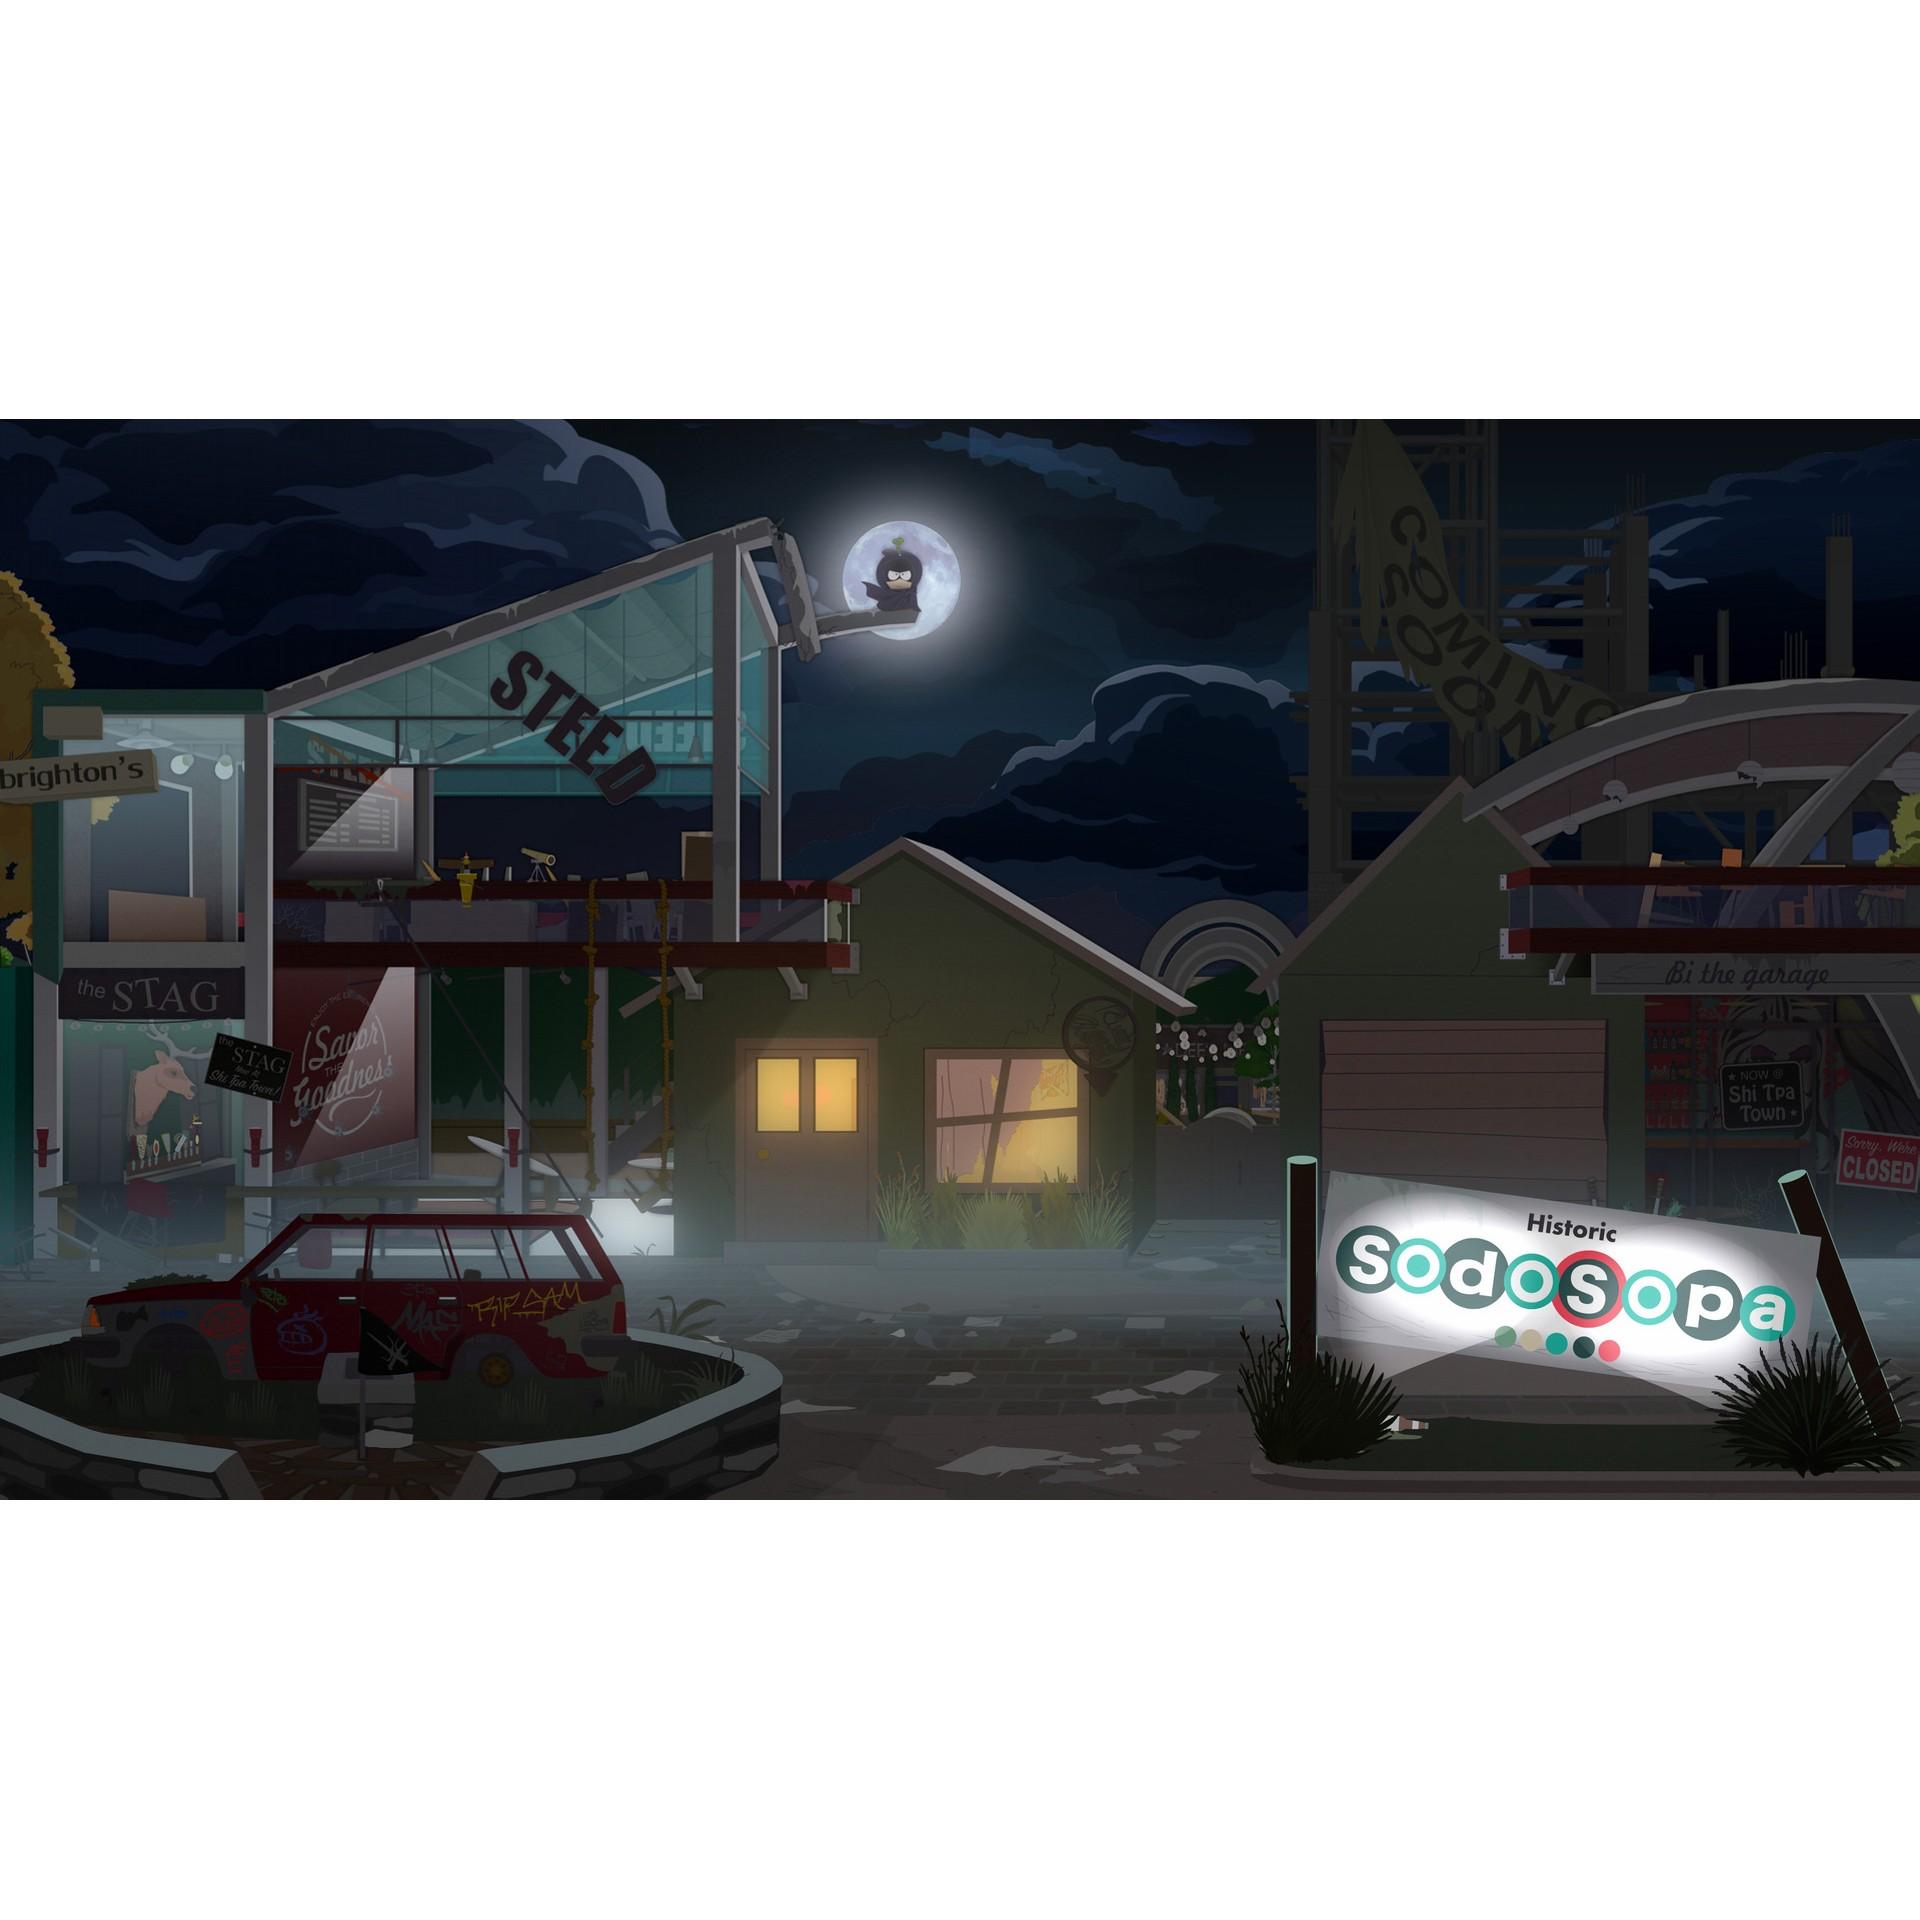 Joc South Park The Fractured But Whole pentru Xbox One 7